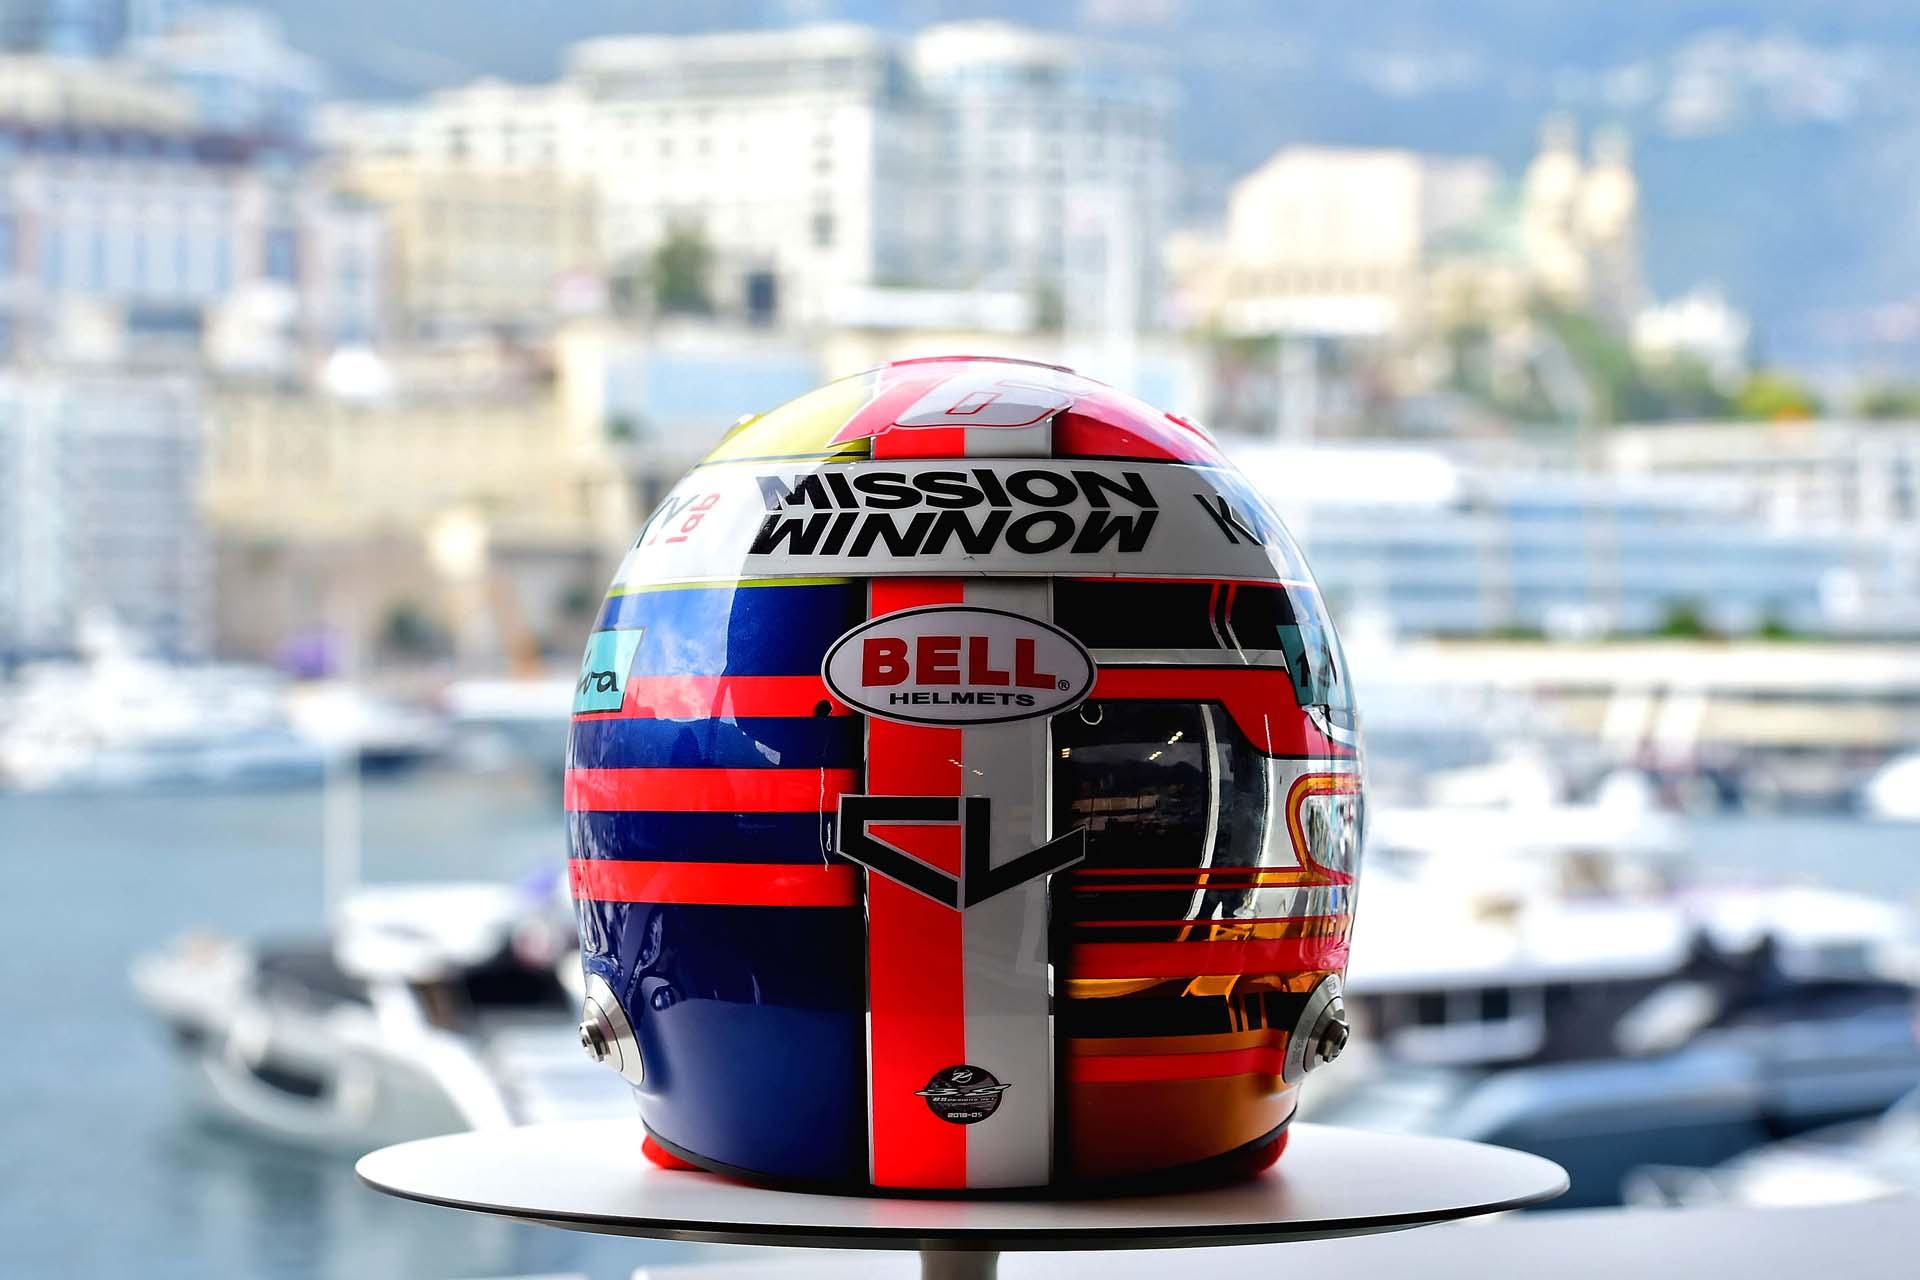 GP MONACO  F1/2019 - MERCOLEDÌ 22/05/2019